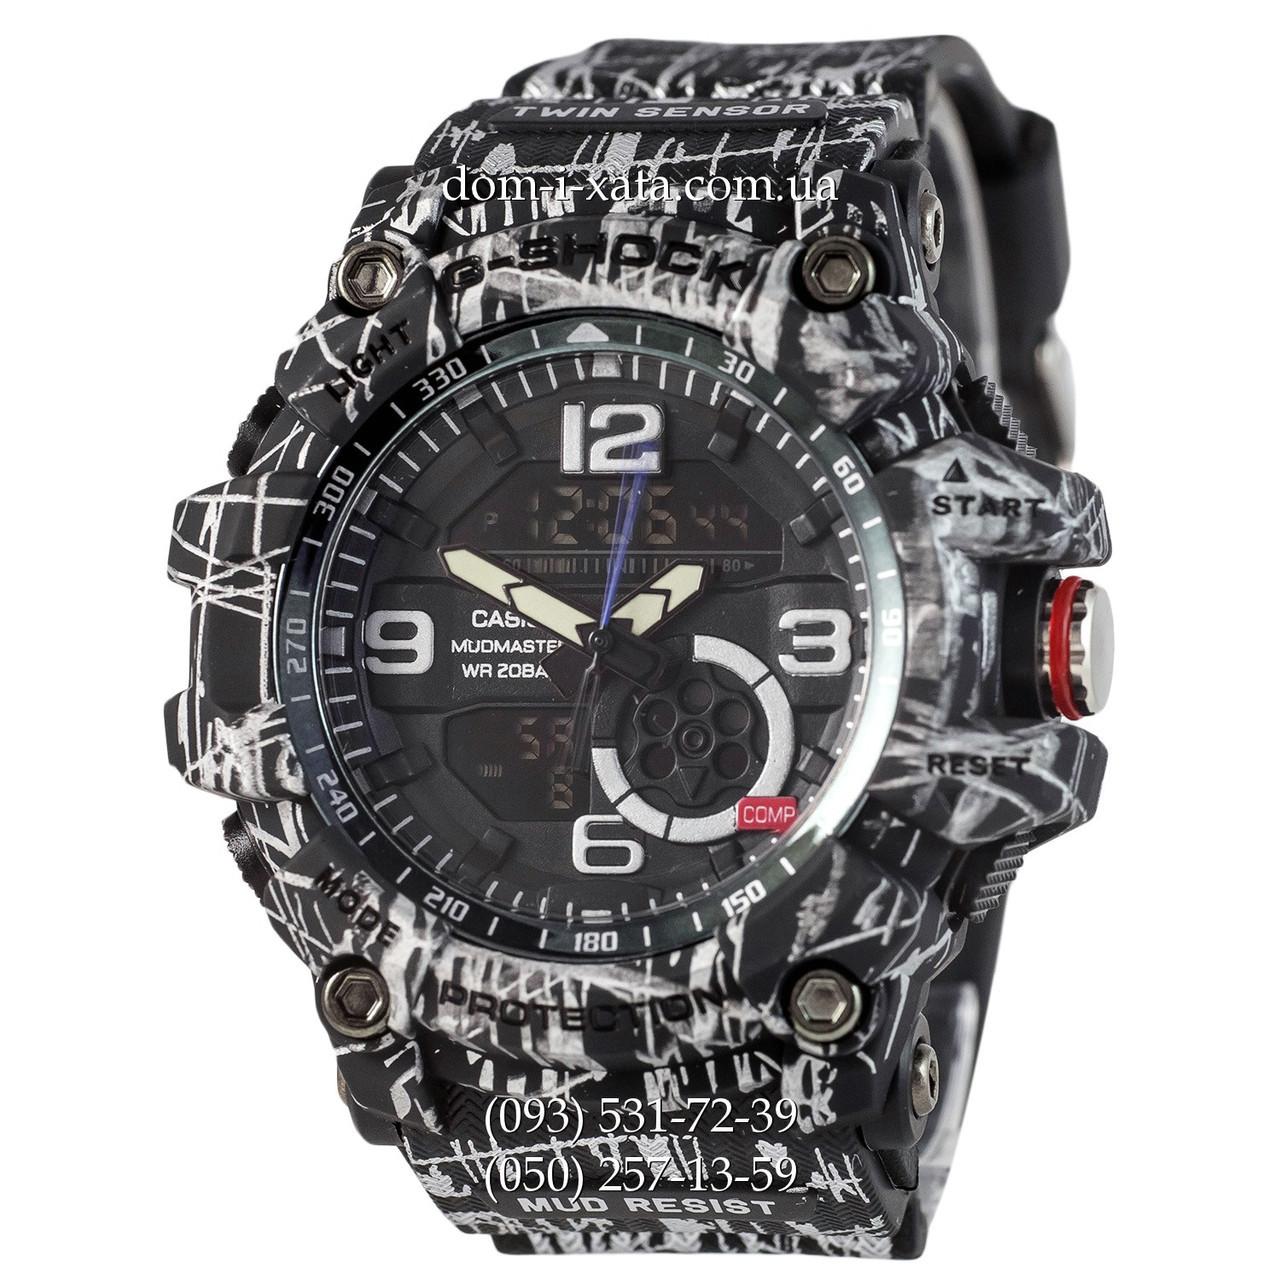 20f24d60 Электронные часы Casio G-Shock GG-1000 Mud-Black, спортивные часы Джи